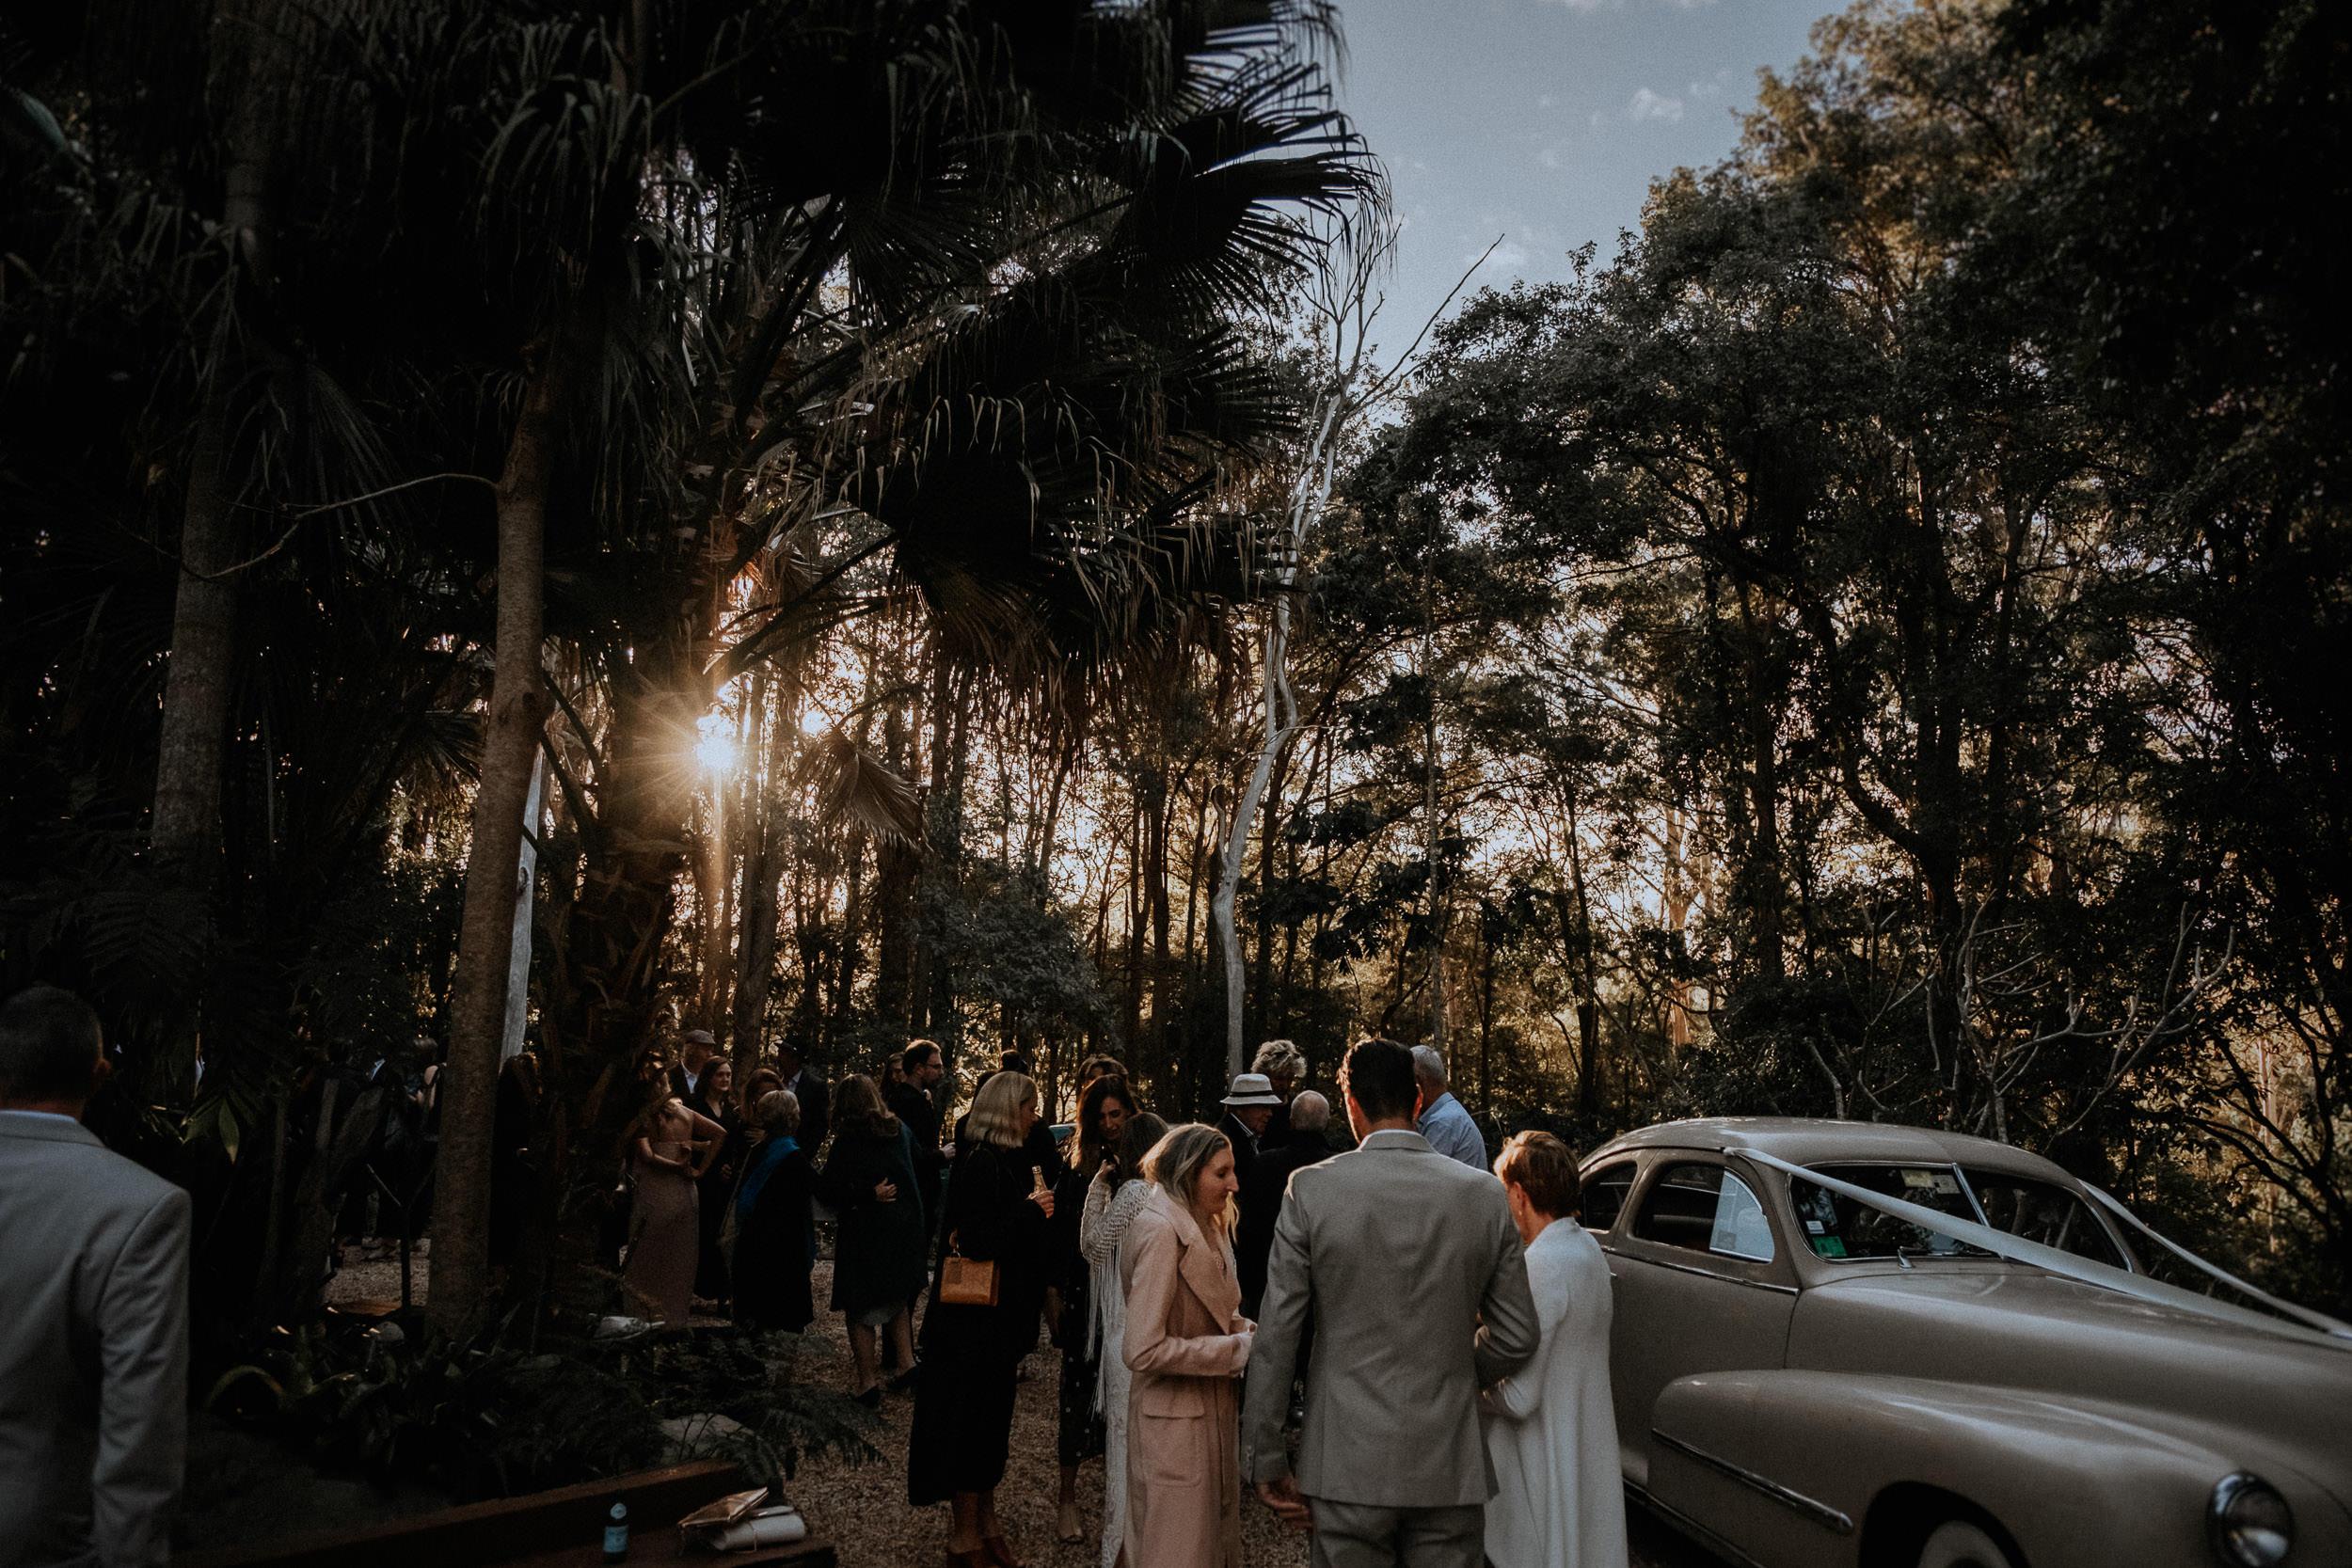 S&A Elopement - Kings & Thieves - Shred 'Til Dead - Central Coast Beach Forest Wedding - 339.jpg